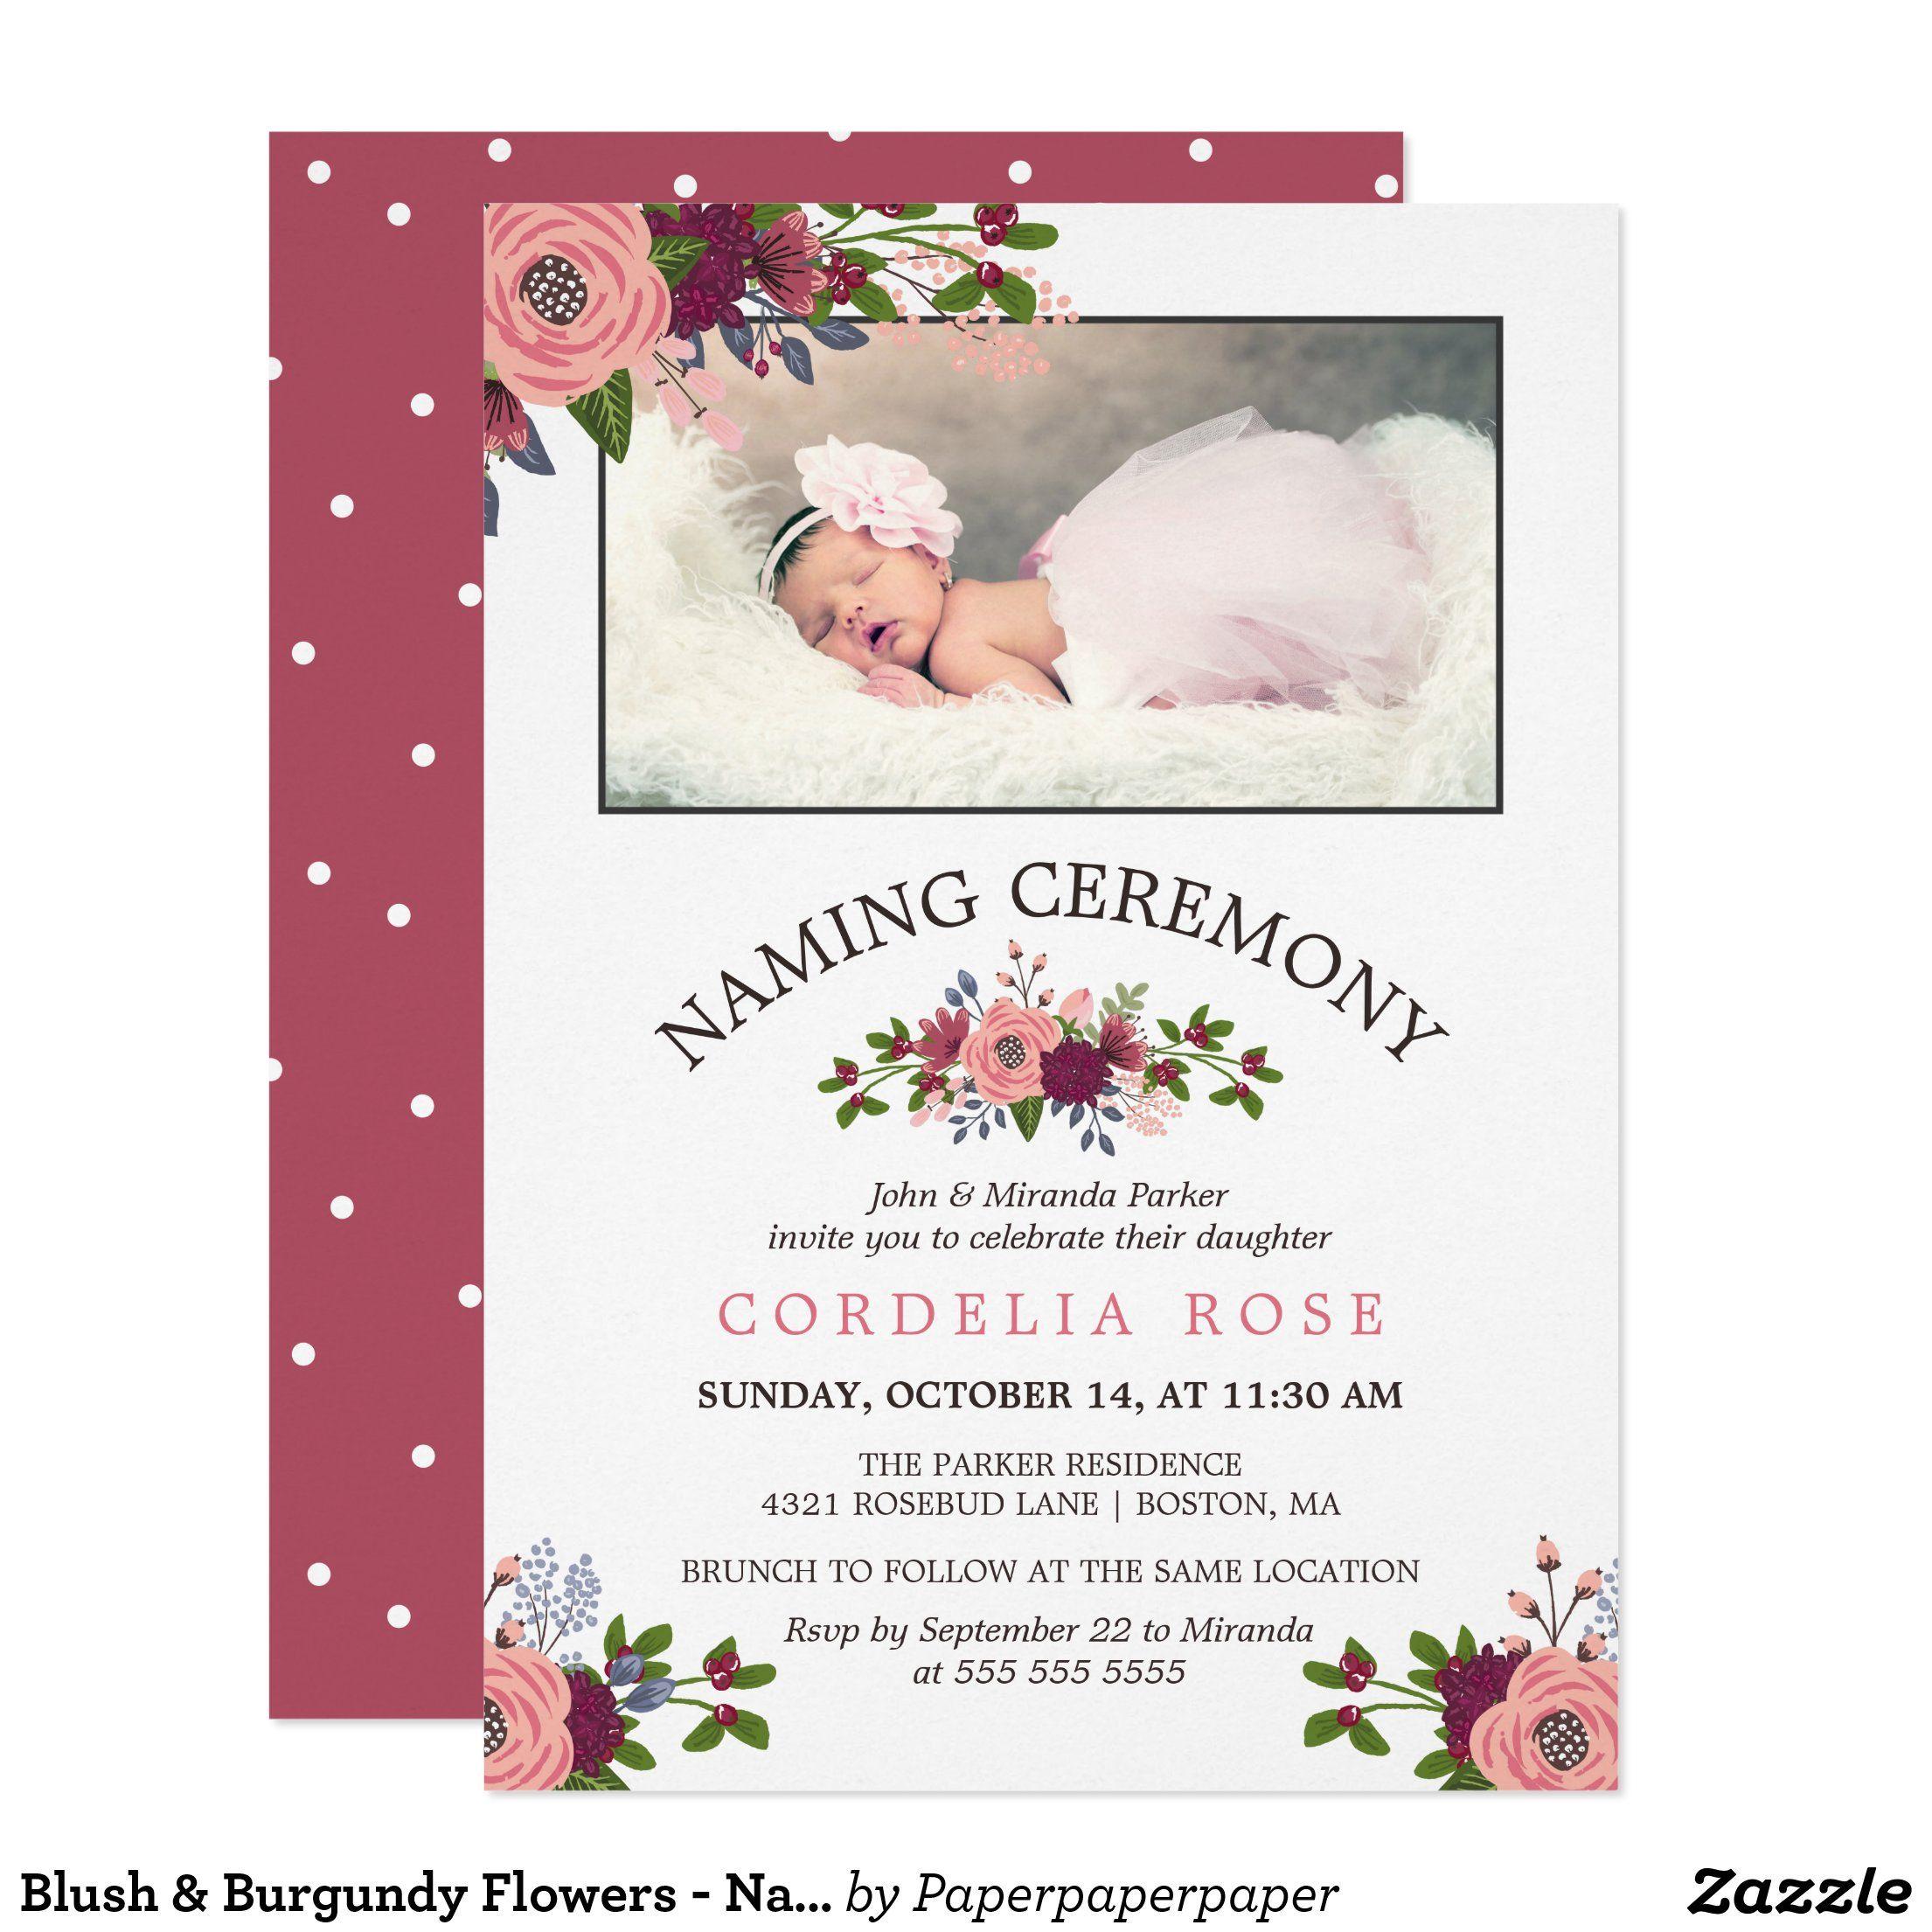 Blush Burgundy Flowers Naming Ceremony Invitation Zazzle Com Naming Ceremony Invitation Naming Ceremony Burgundy Flowers